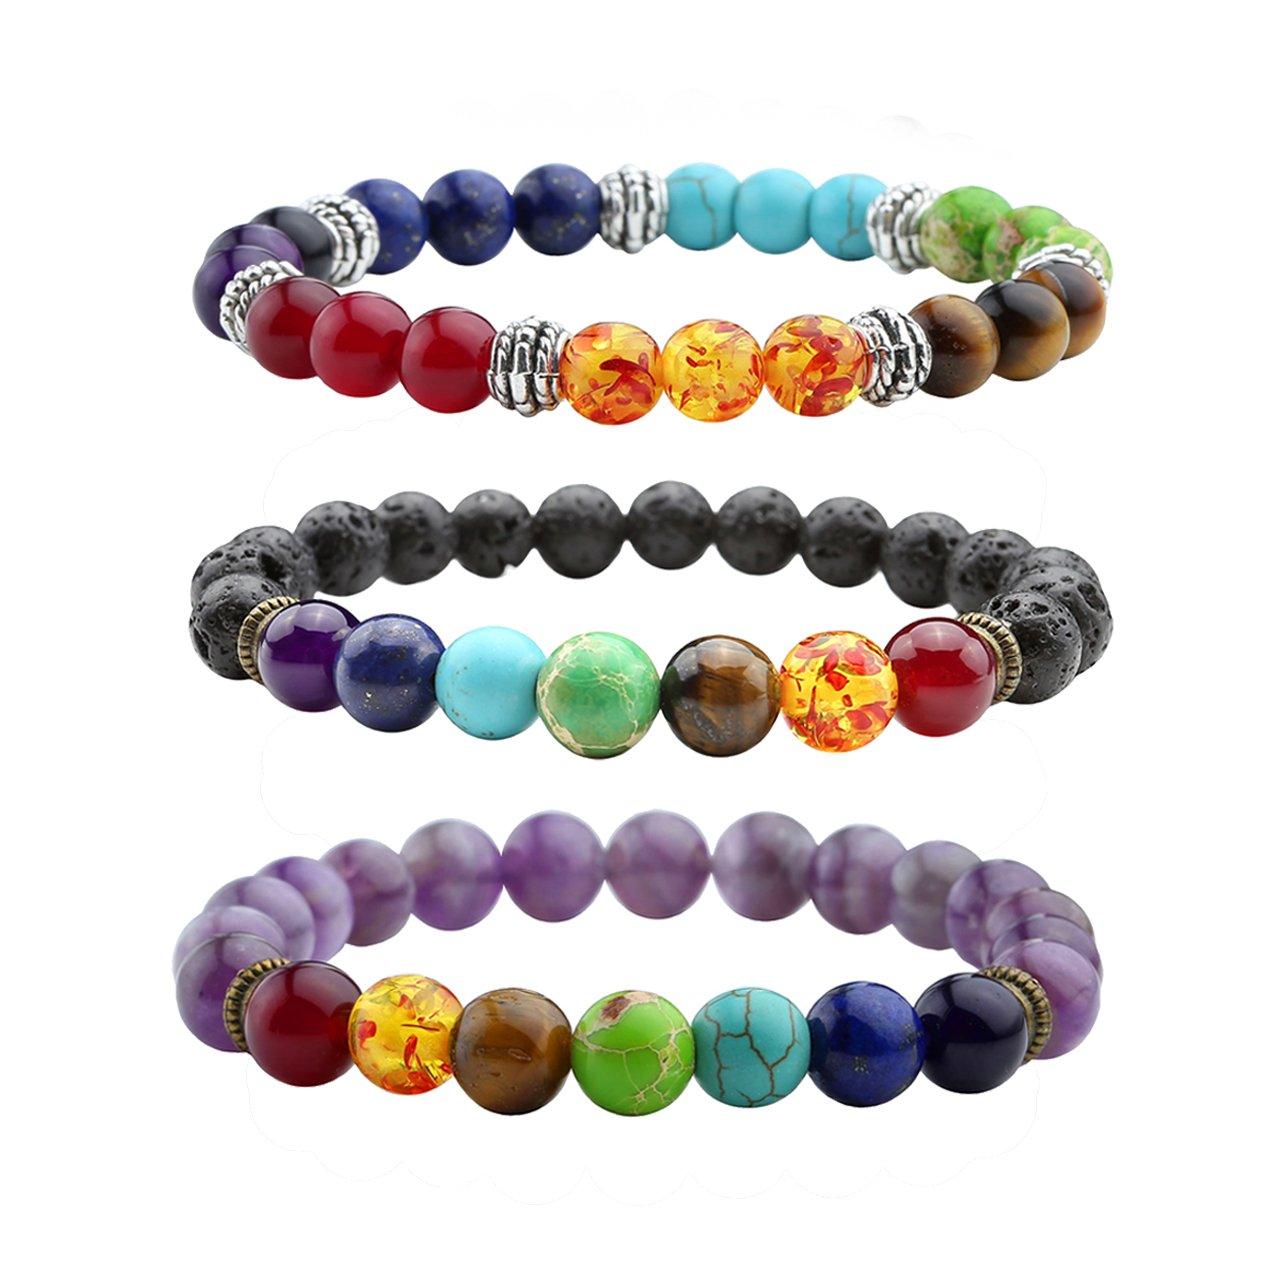 Top Plaza 7 Chakra Healing Balance Energy Crystal Gemstone Beads Bracelets Set, 8MM Beads (Amethyst/Lava Rock Stone/Reiki Chakra Bracelet/3 pcs)